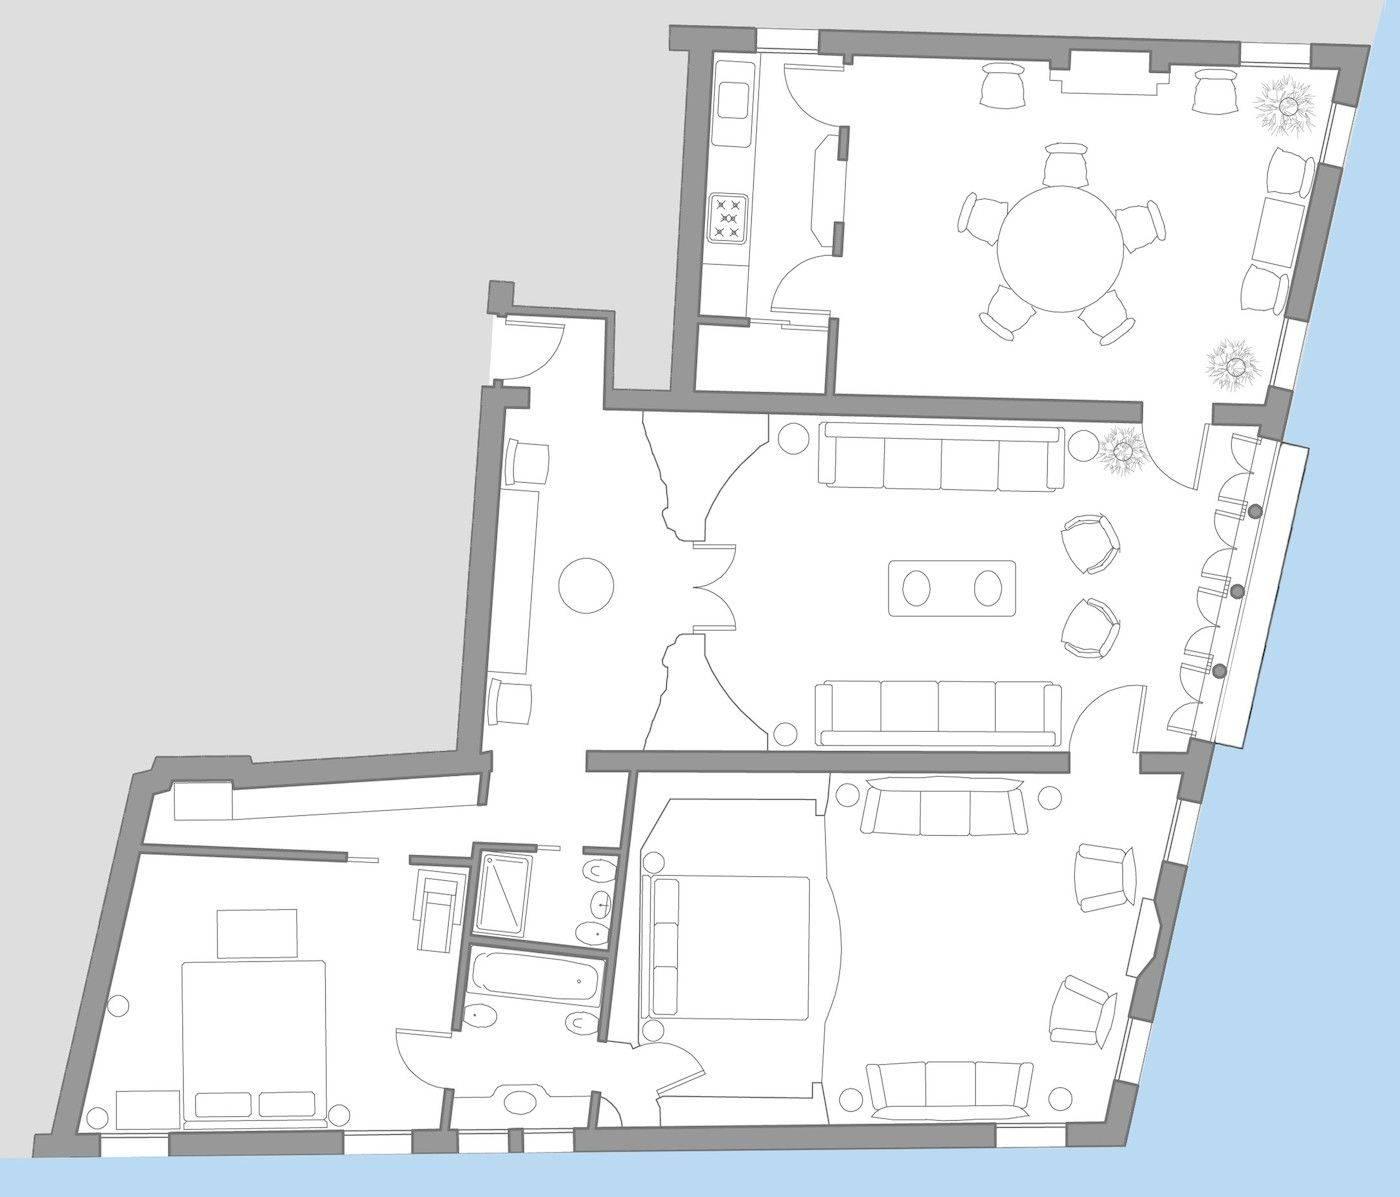 Morosini floor plan